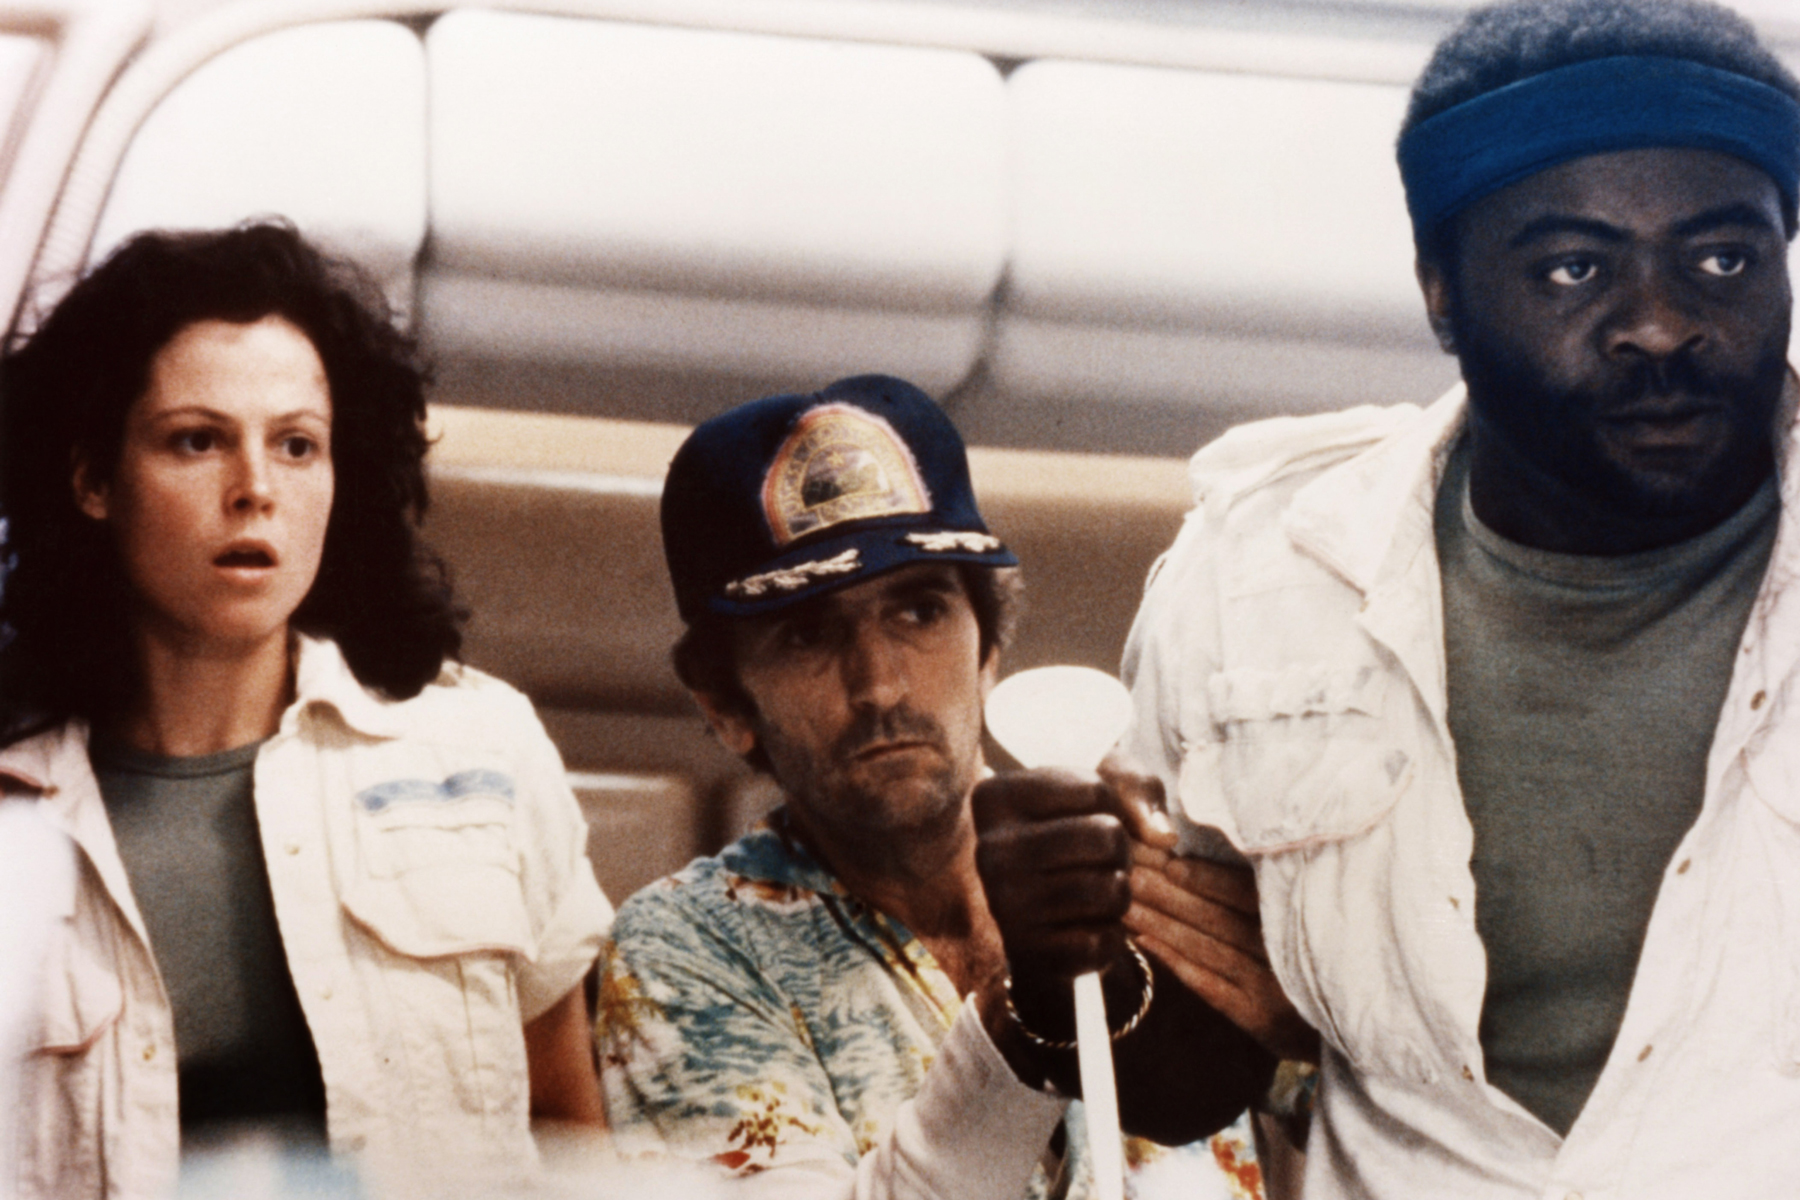 ALIEN, from left: Sigourney Weaver, Harry Dean Stanton, Yaphet Kotto, 1979, TM & Copyright © 20th Century Fox Film Corp./courtesy Everett Collection